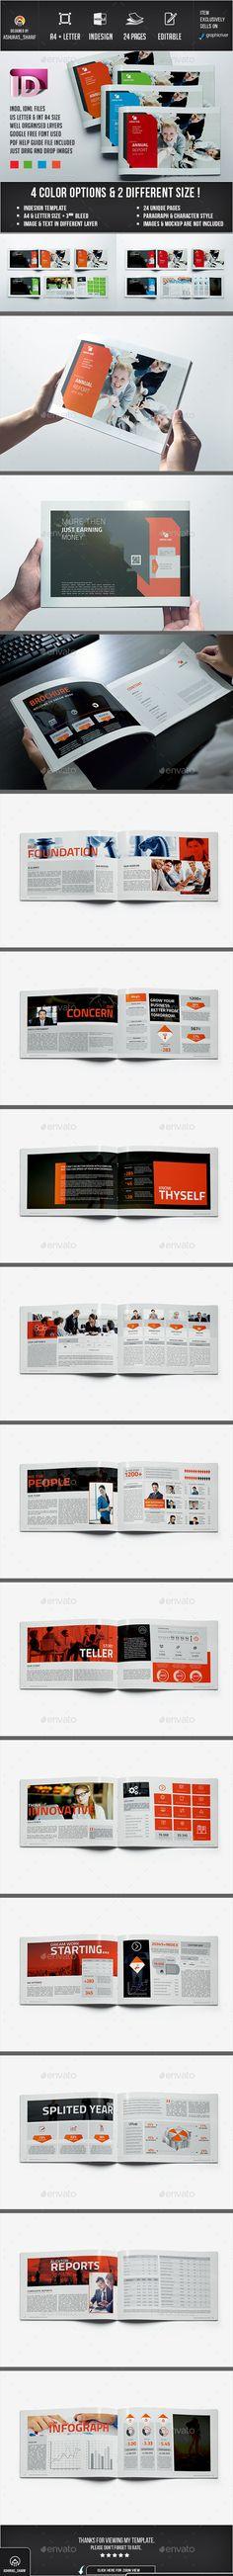 Annual Report Template PSD #design Download: http://graphicriver.net/item/annual-report-06/13542523?ref=ksioks